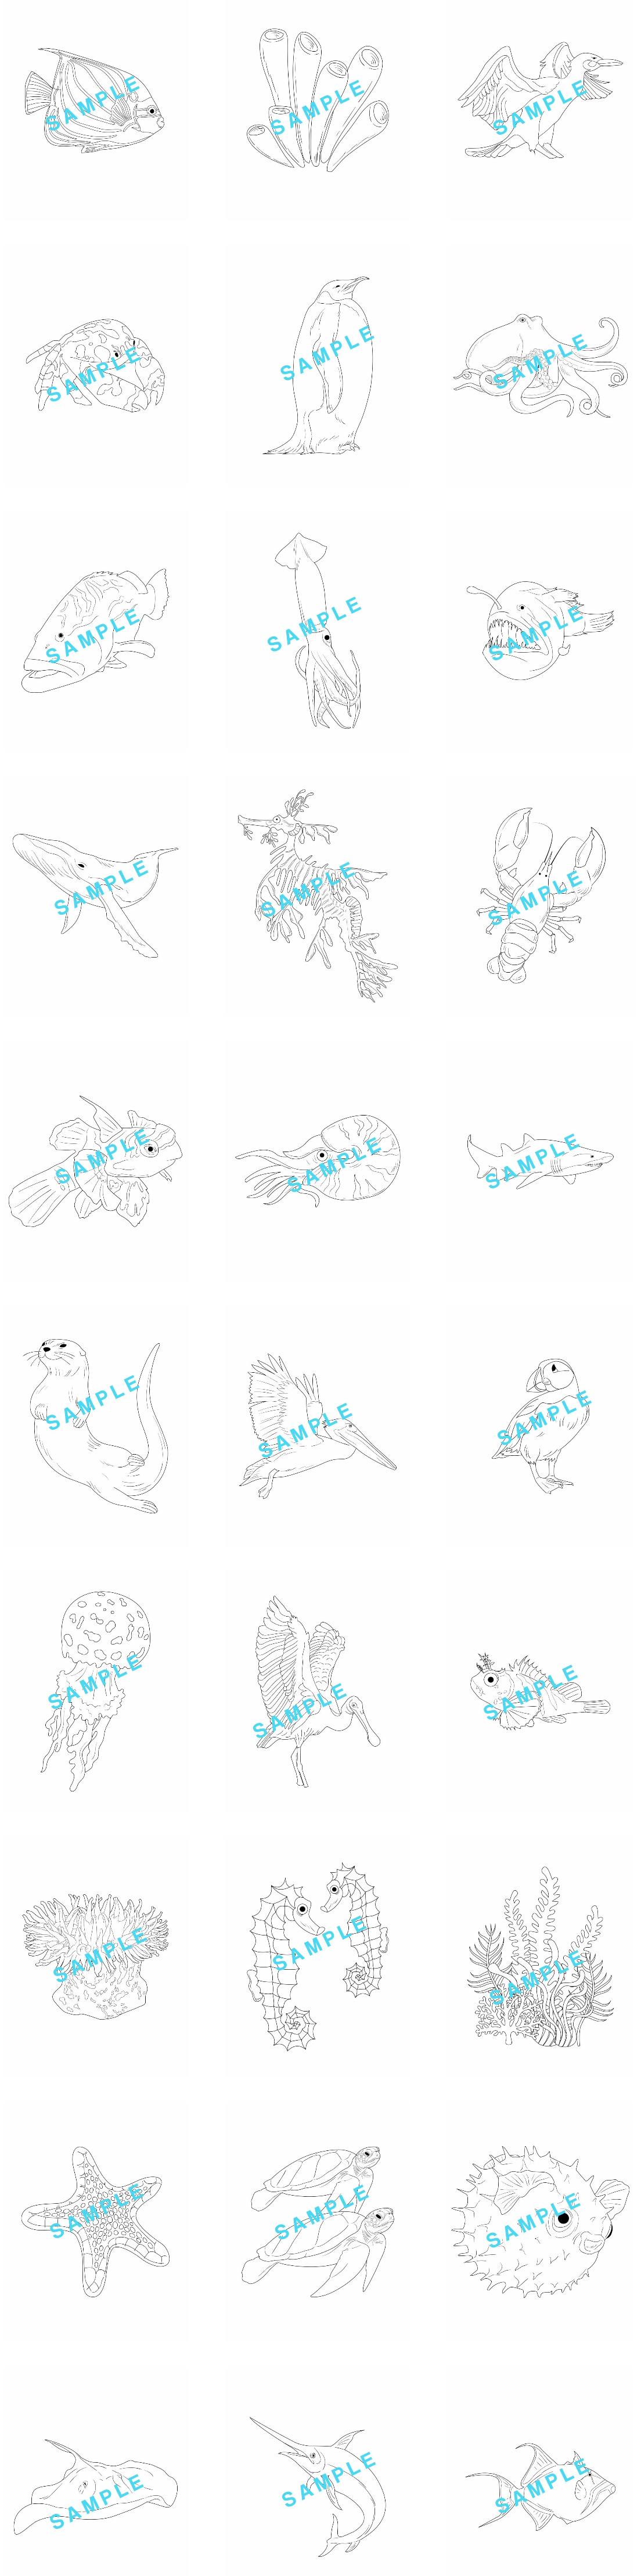 Aquatic-Animals-Coloring-Pack-feature